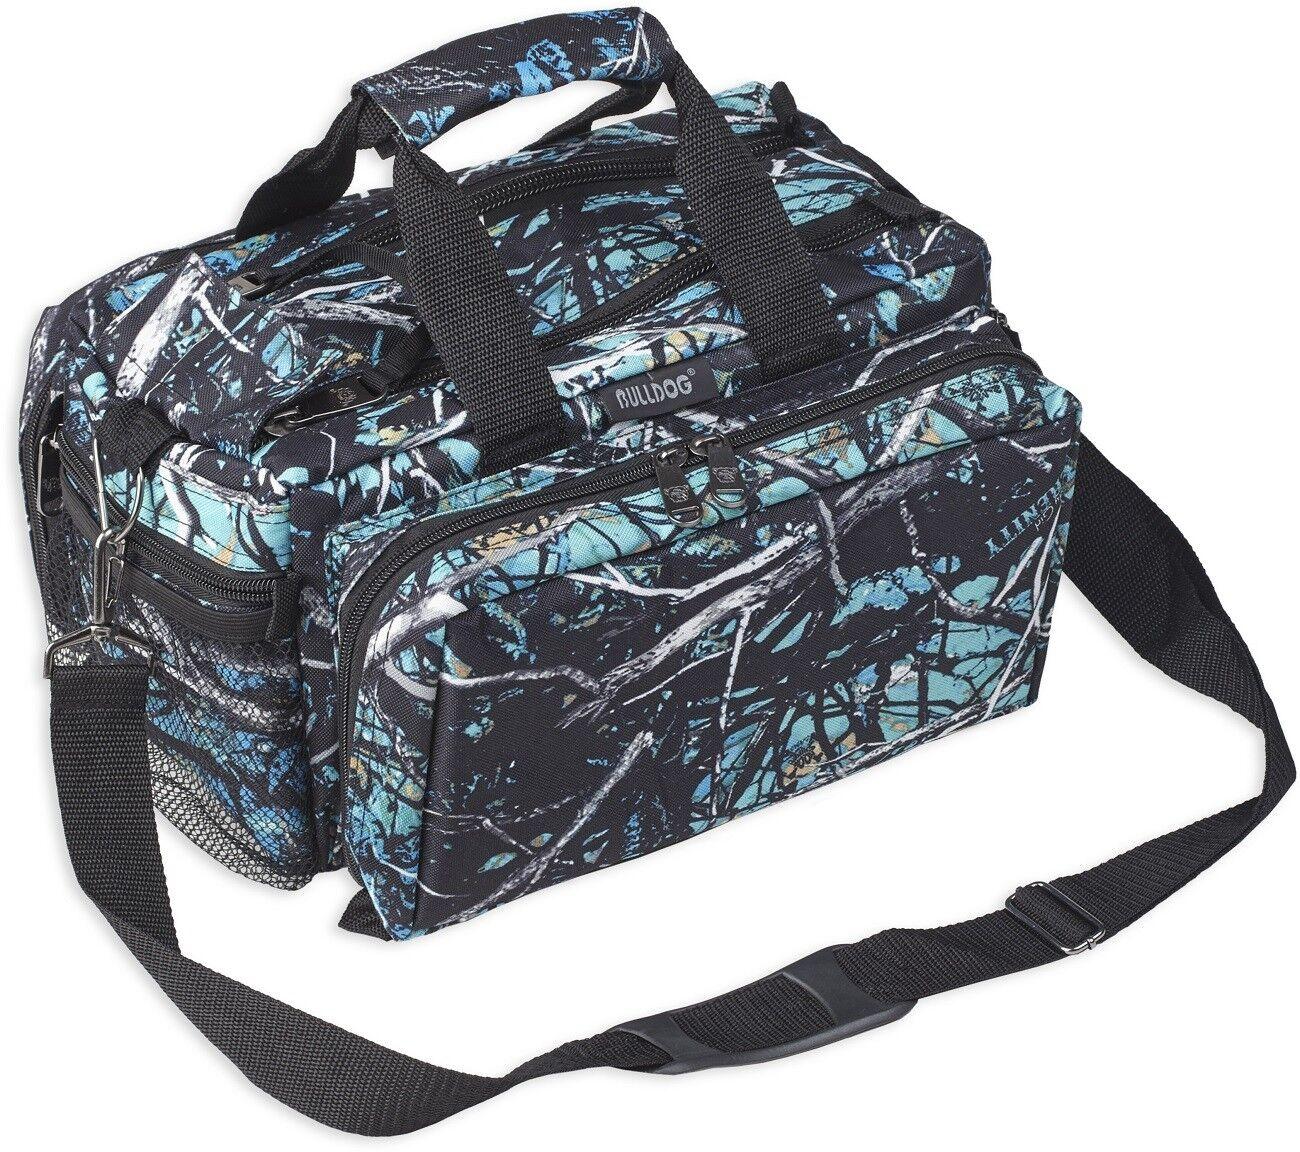 Muddy Girl Serenity Deluxe Range Bag, Nylon Camouflage Bulldog Cases BD910SRN - $45.95